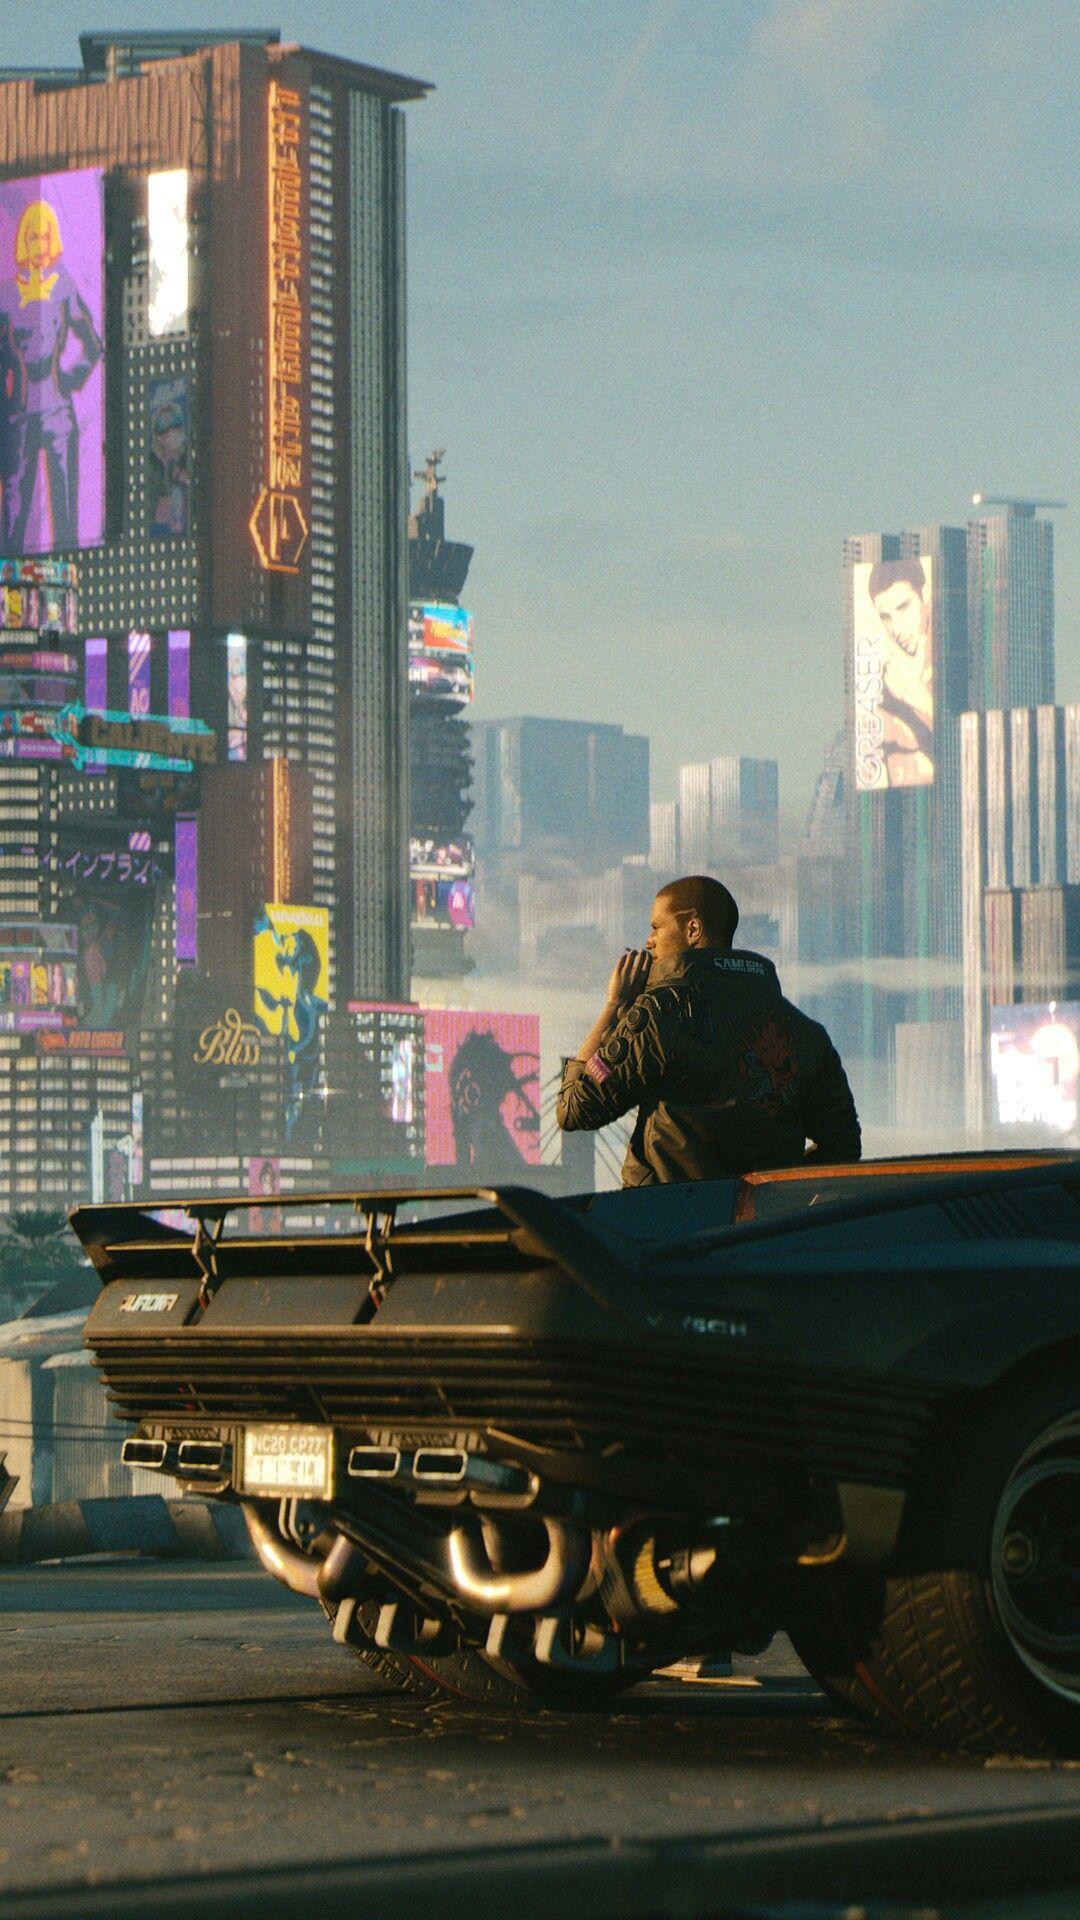 CYBERPUNK 2077 Night City day time Cyberpunk city